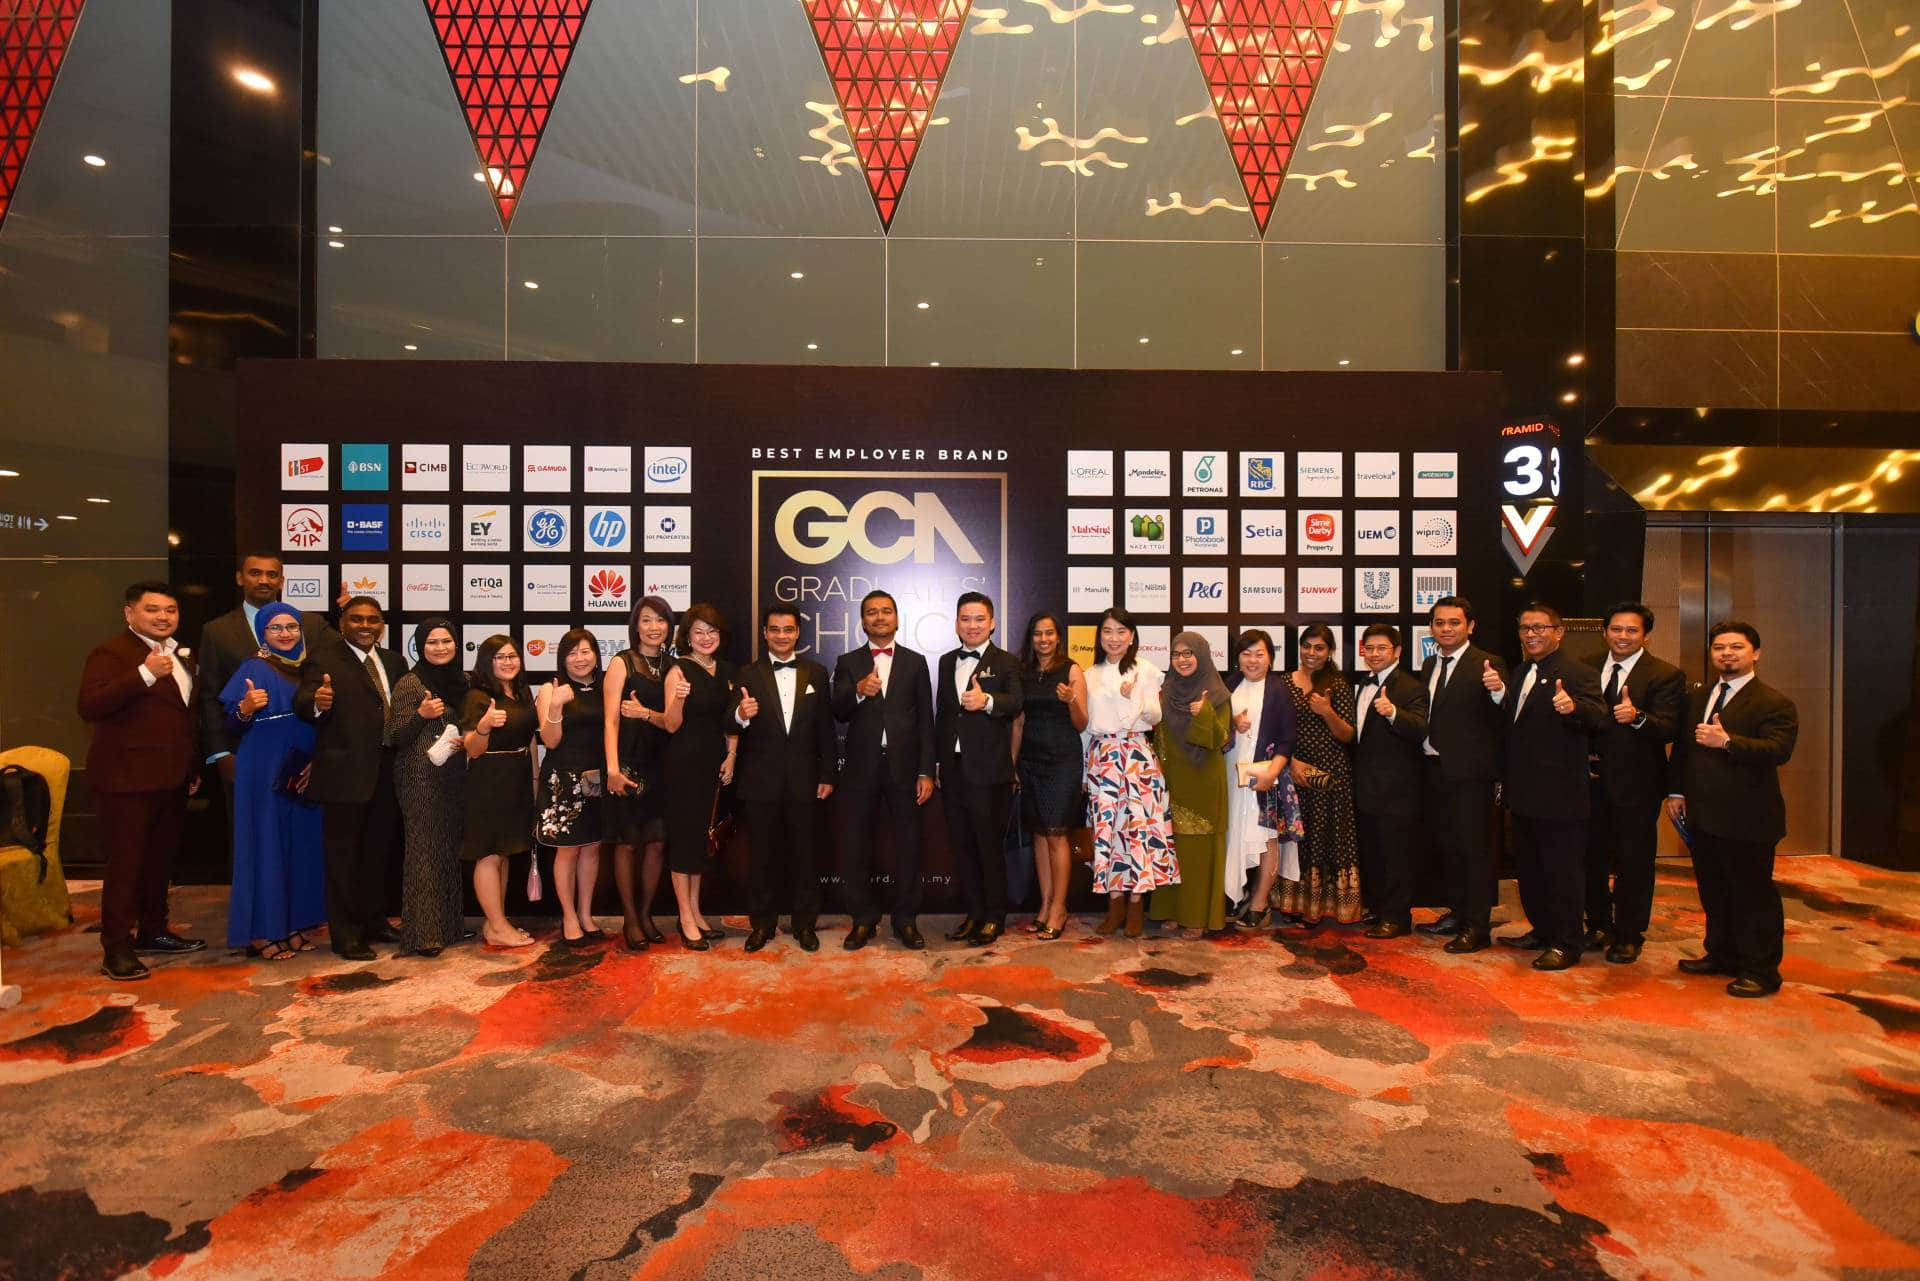 Malayan Banking Bhd has won the 2018 Graduates' Choice Award in the banking category.